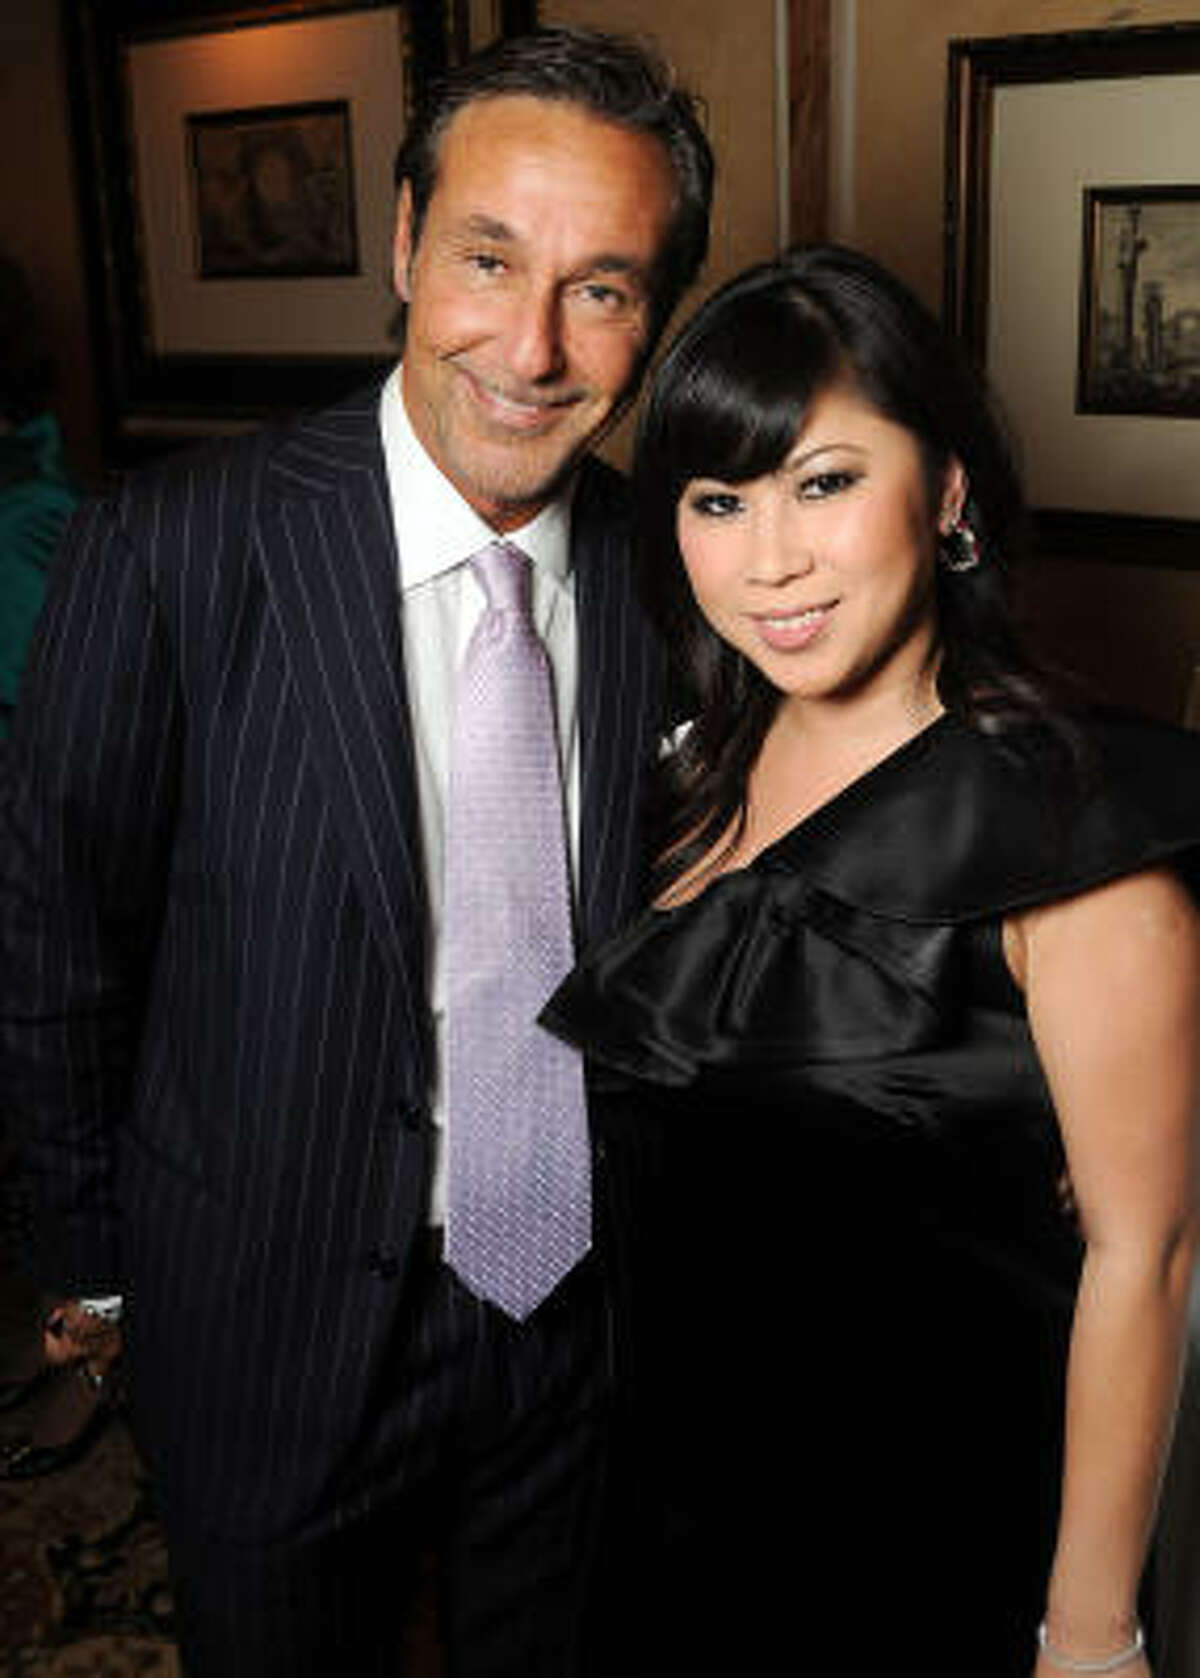 Gianni Schapira and Victoria Nguyen